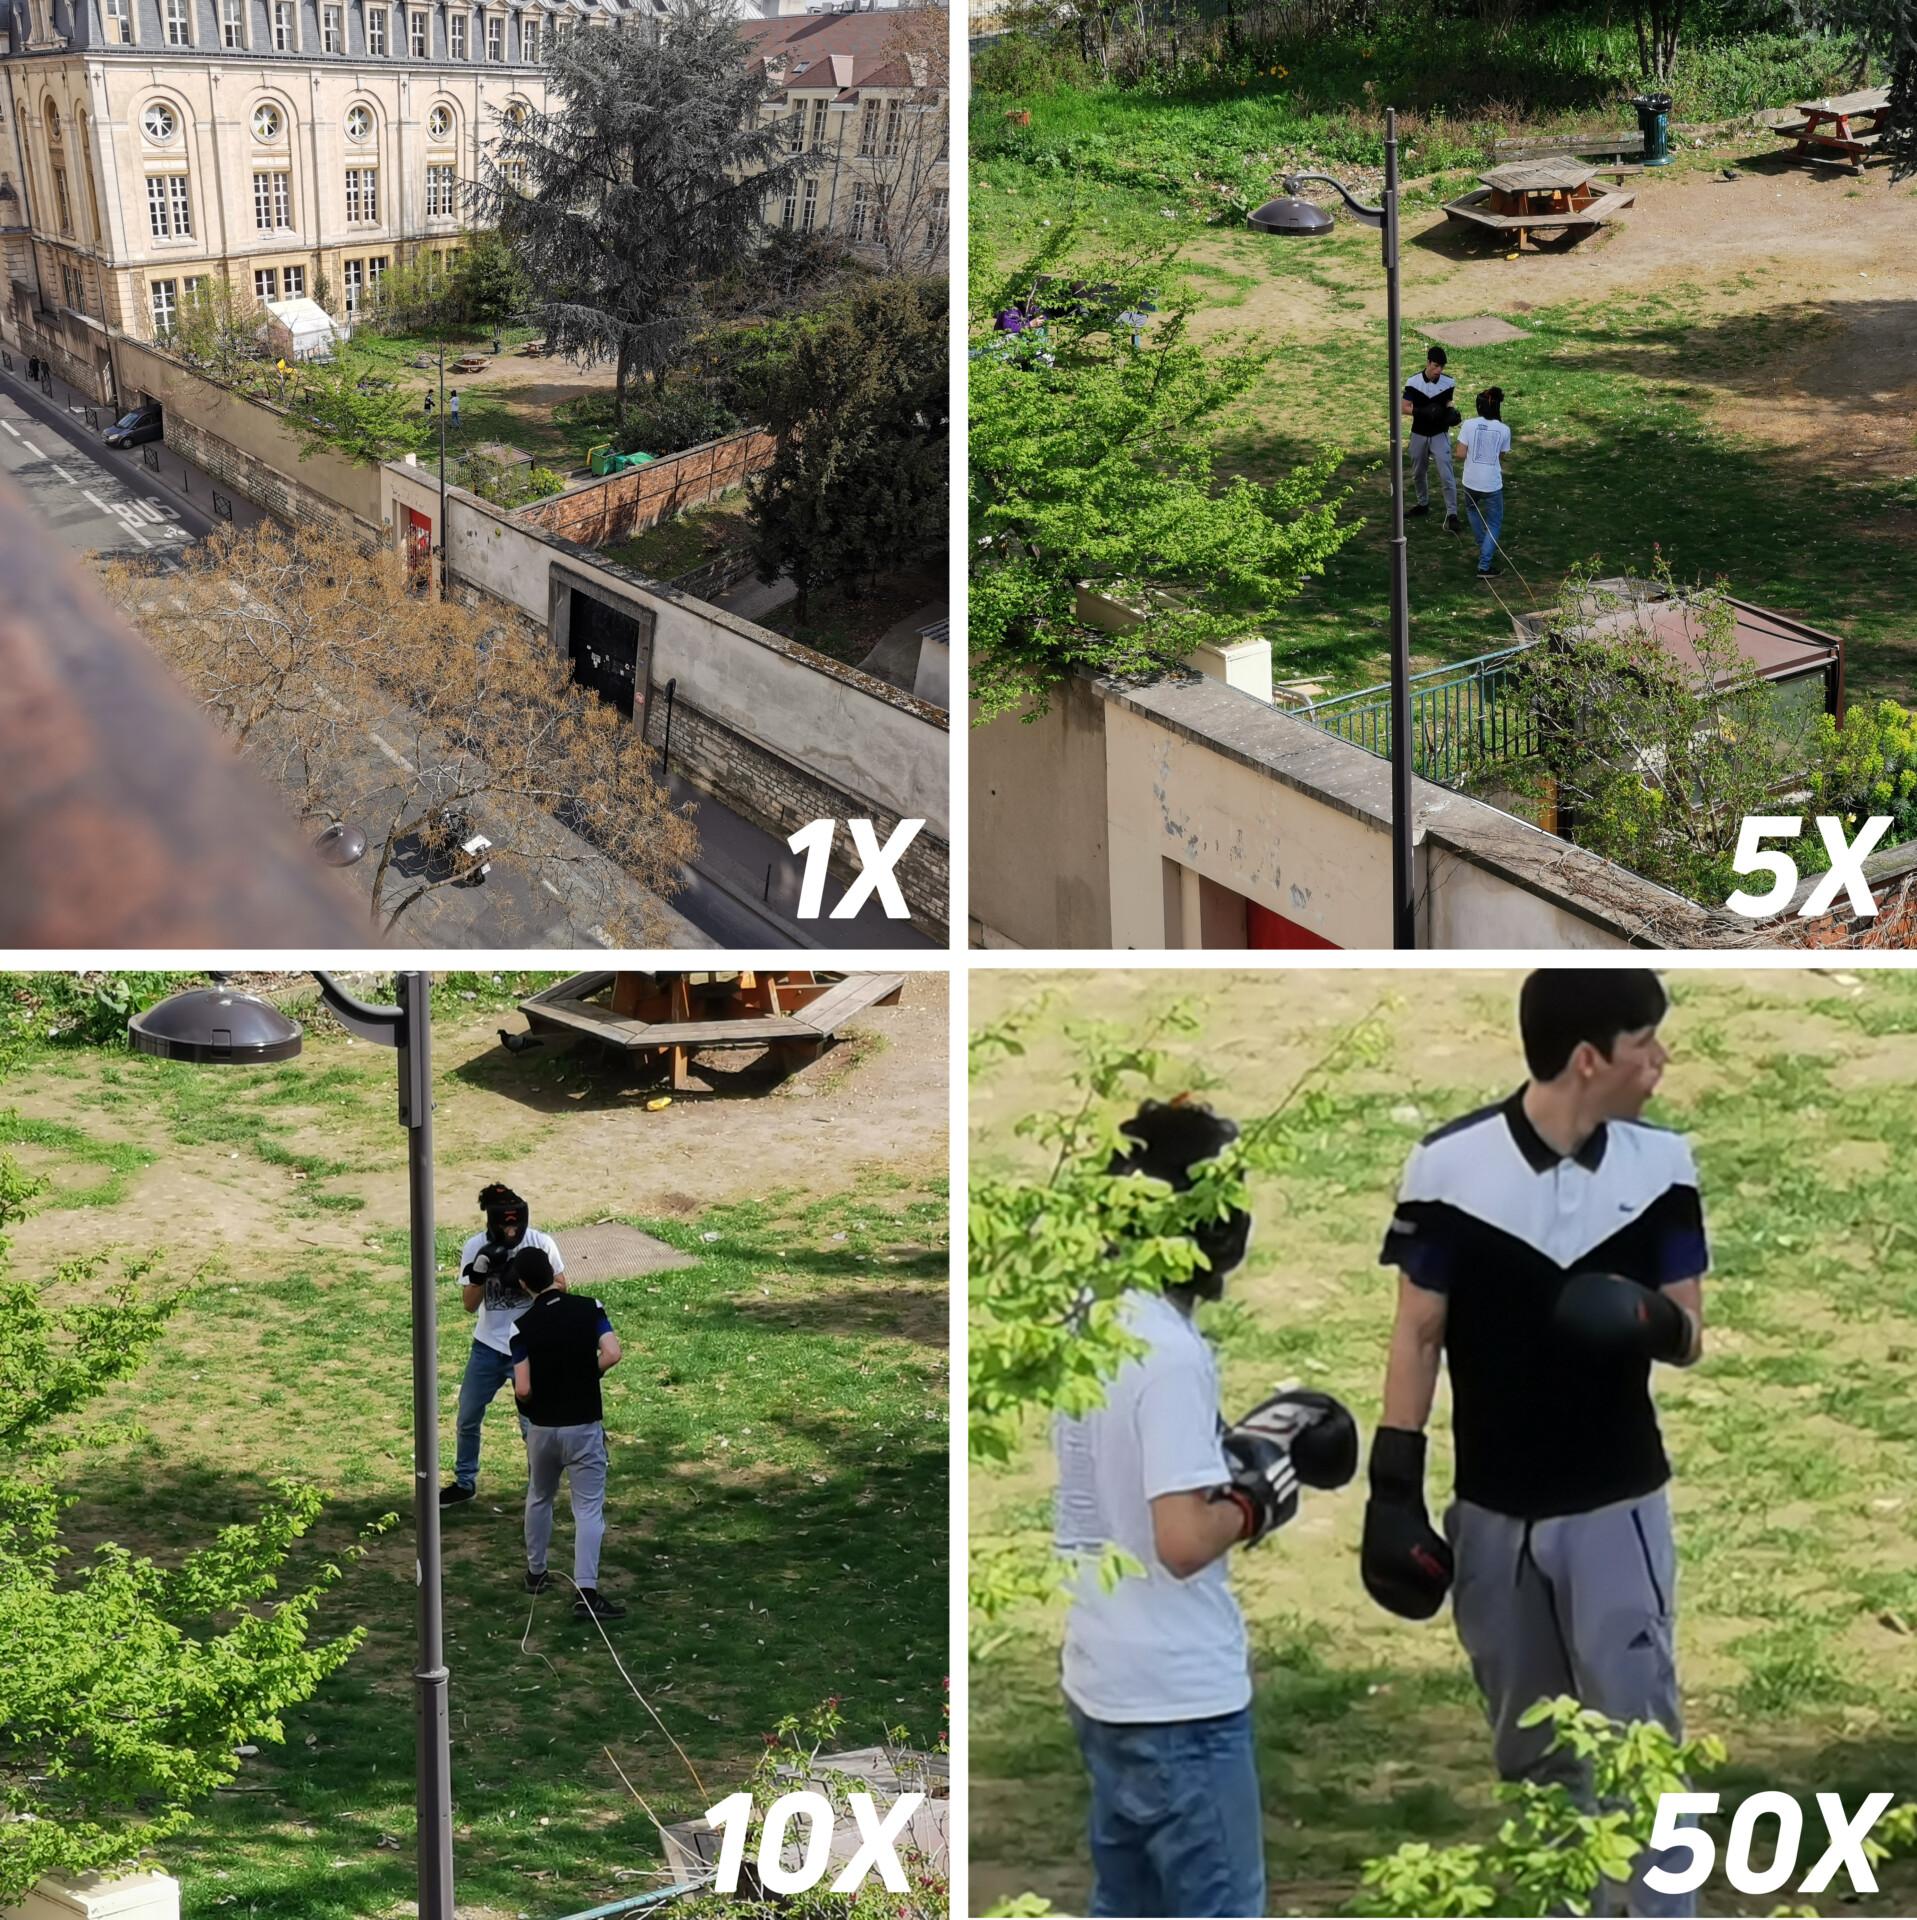 huawei p30 pro outdoor zoom 1x, 5x, 10x, 50x camera samples